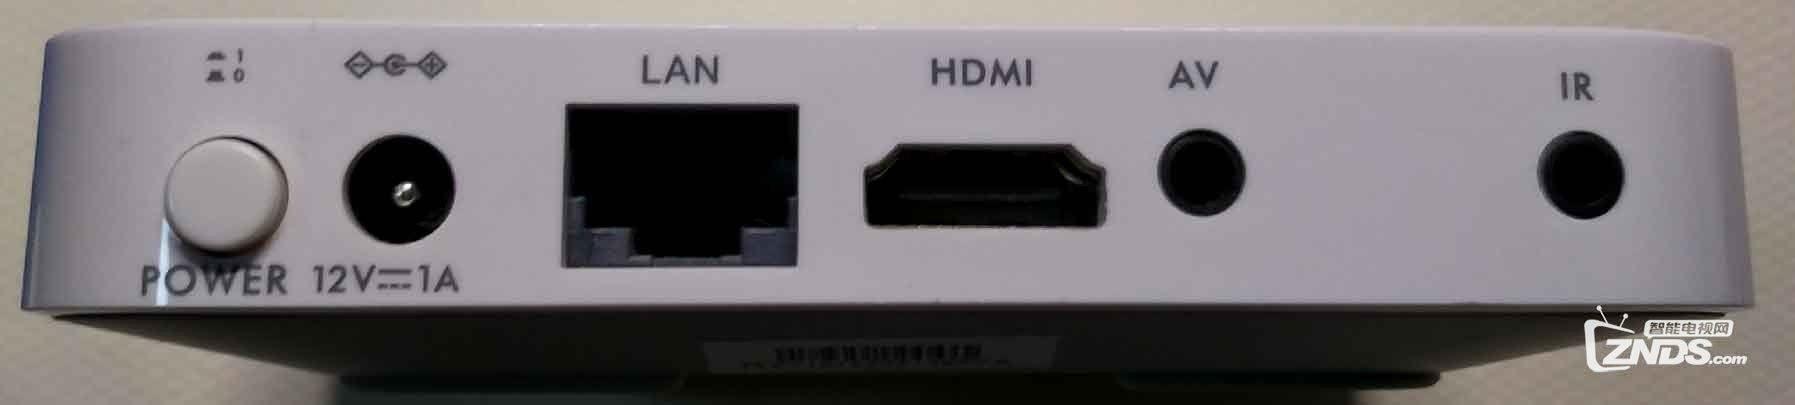 IPTV直播源获取教程,没有电信盒子也可以看IPTV直播